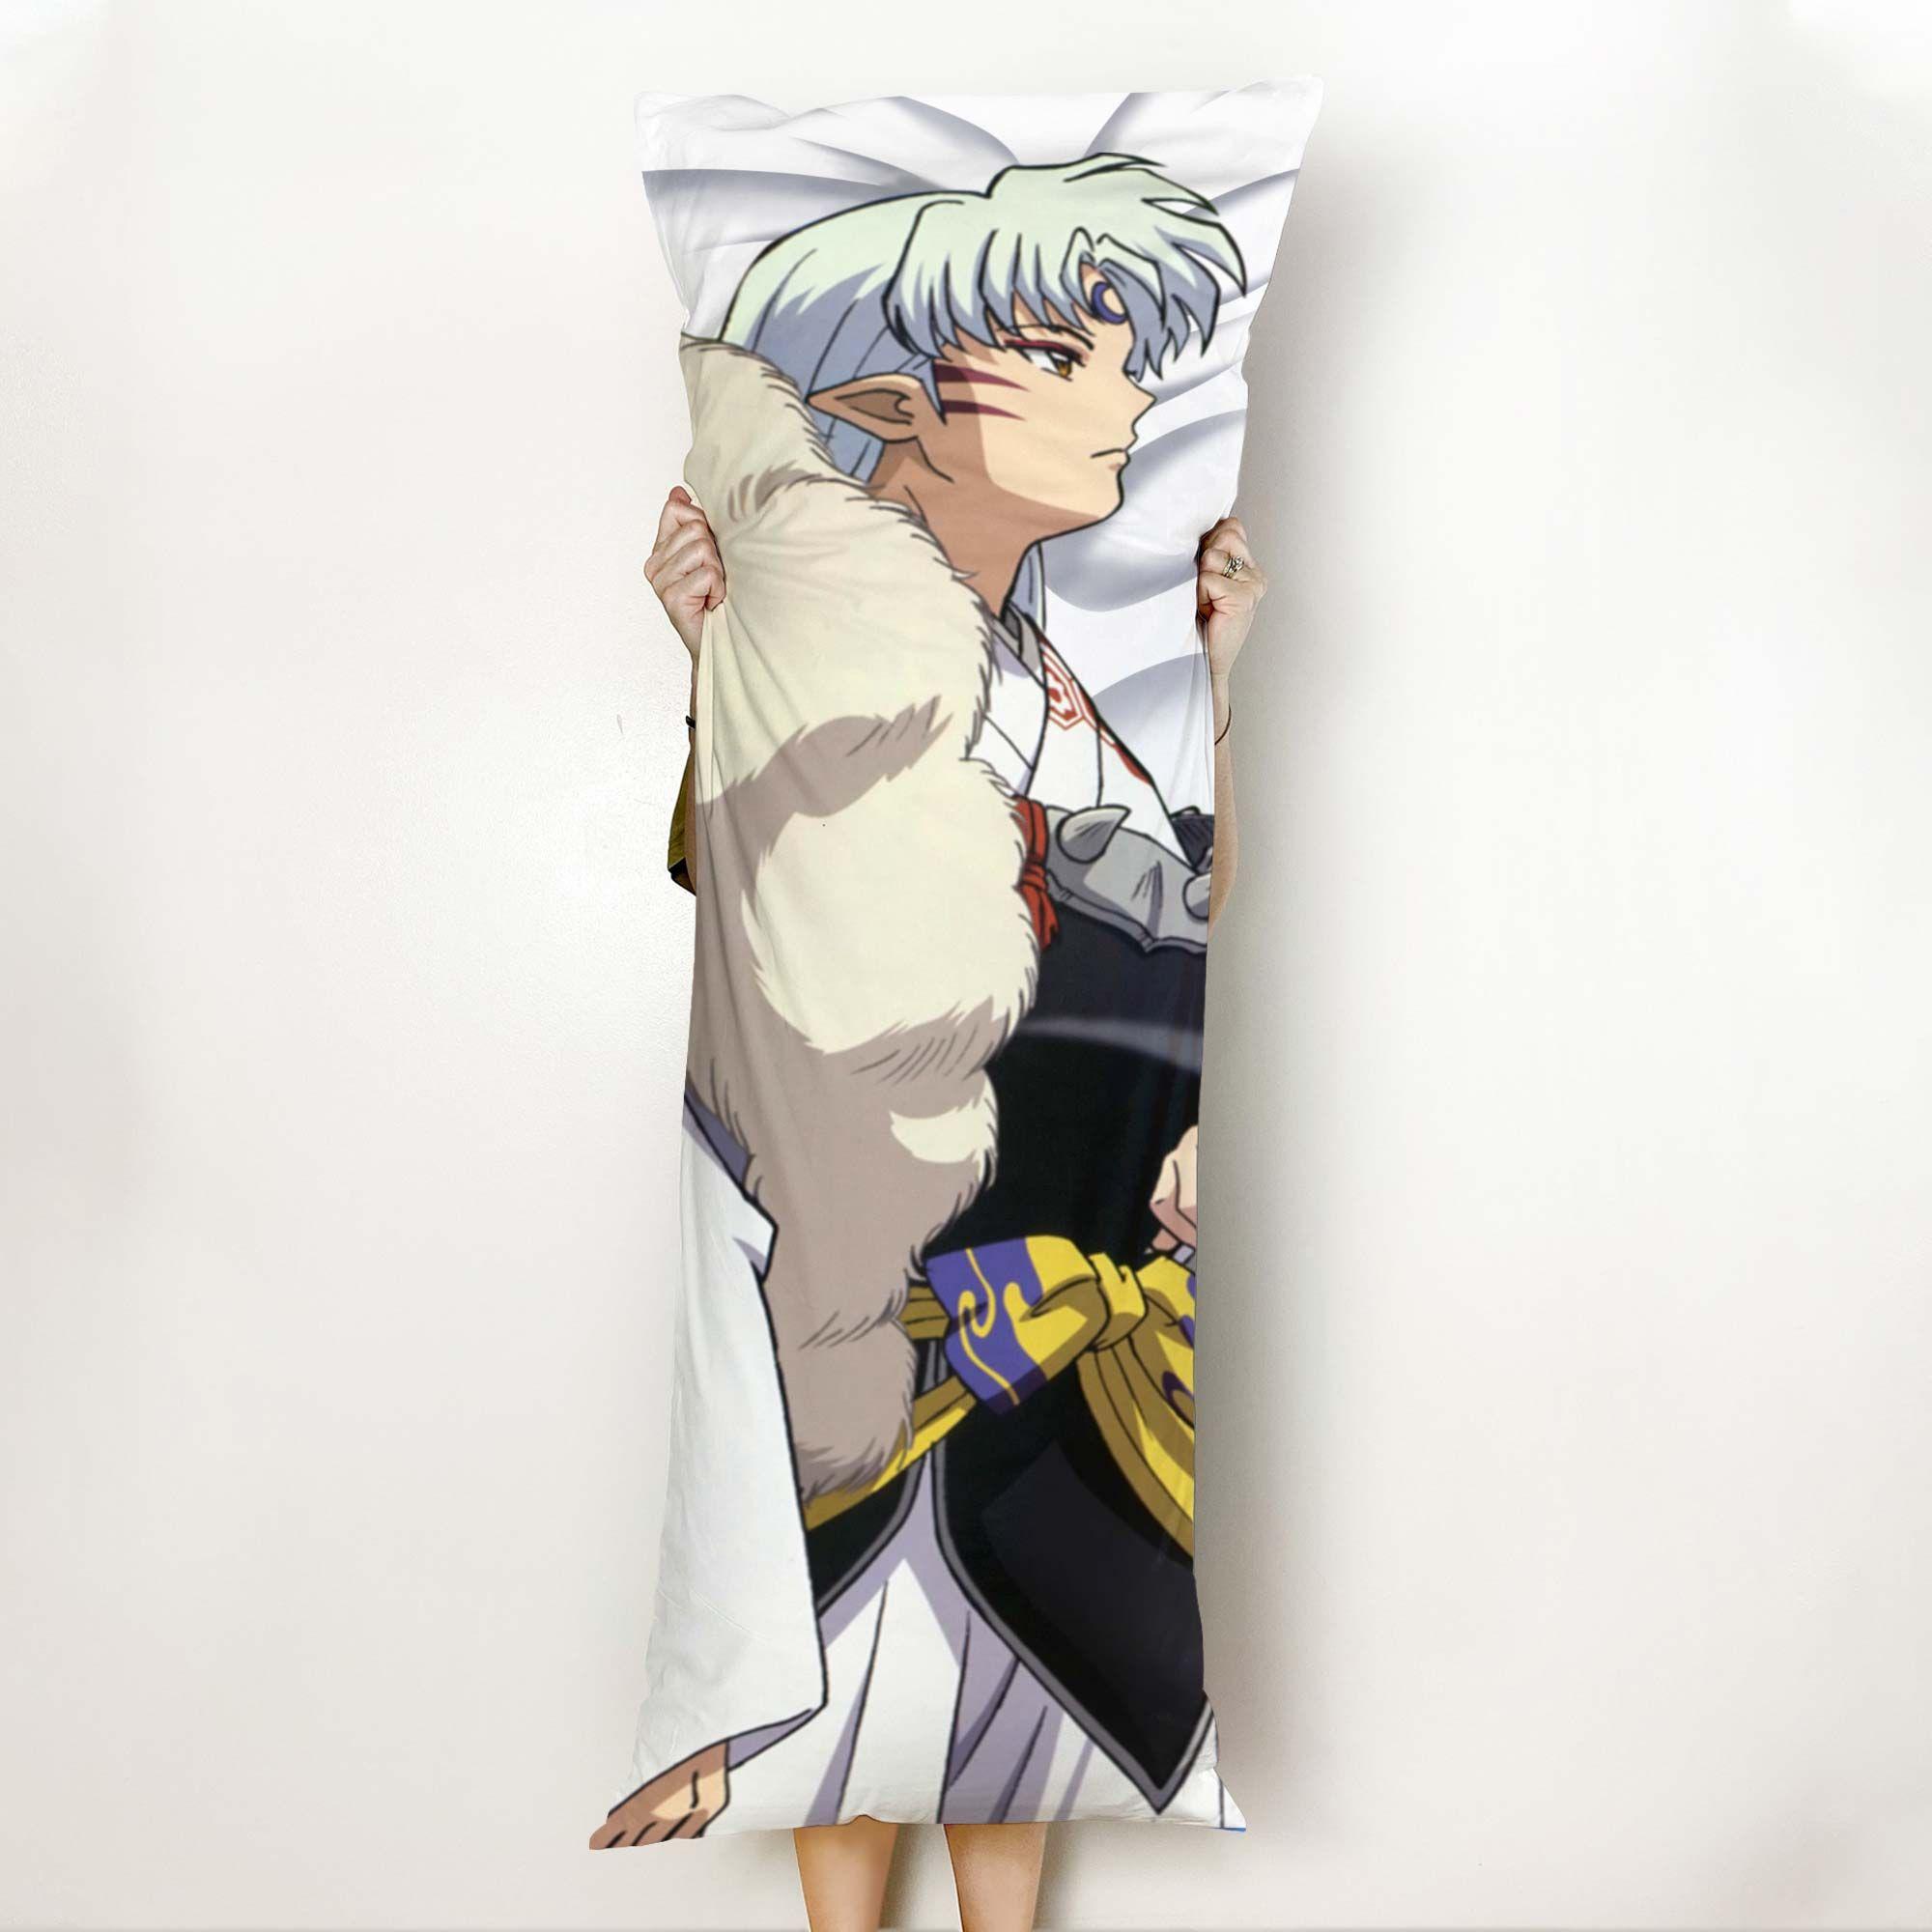 Sesshomaru Body Pillow Cover Custom Inuyasha Anime Gifts Official Merch GO0110